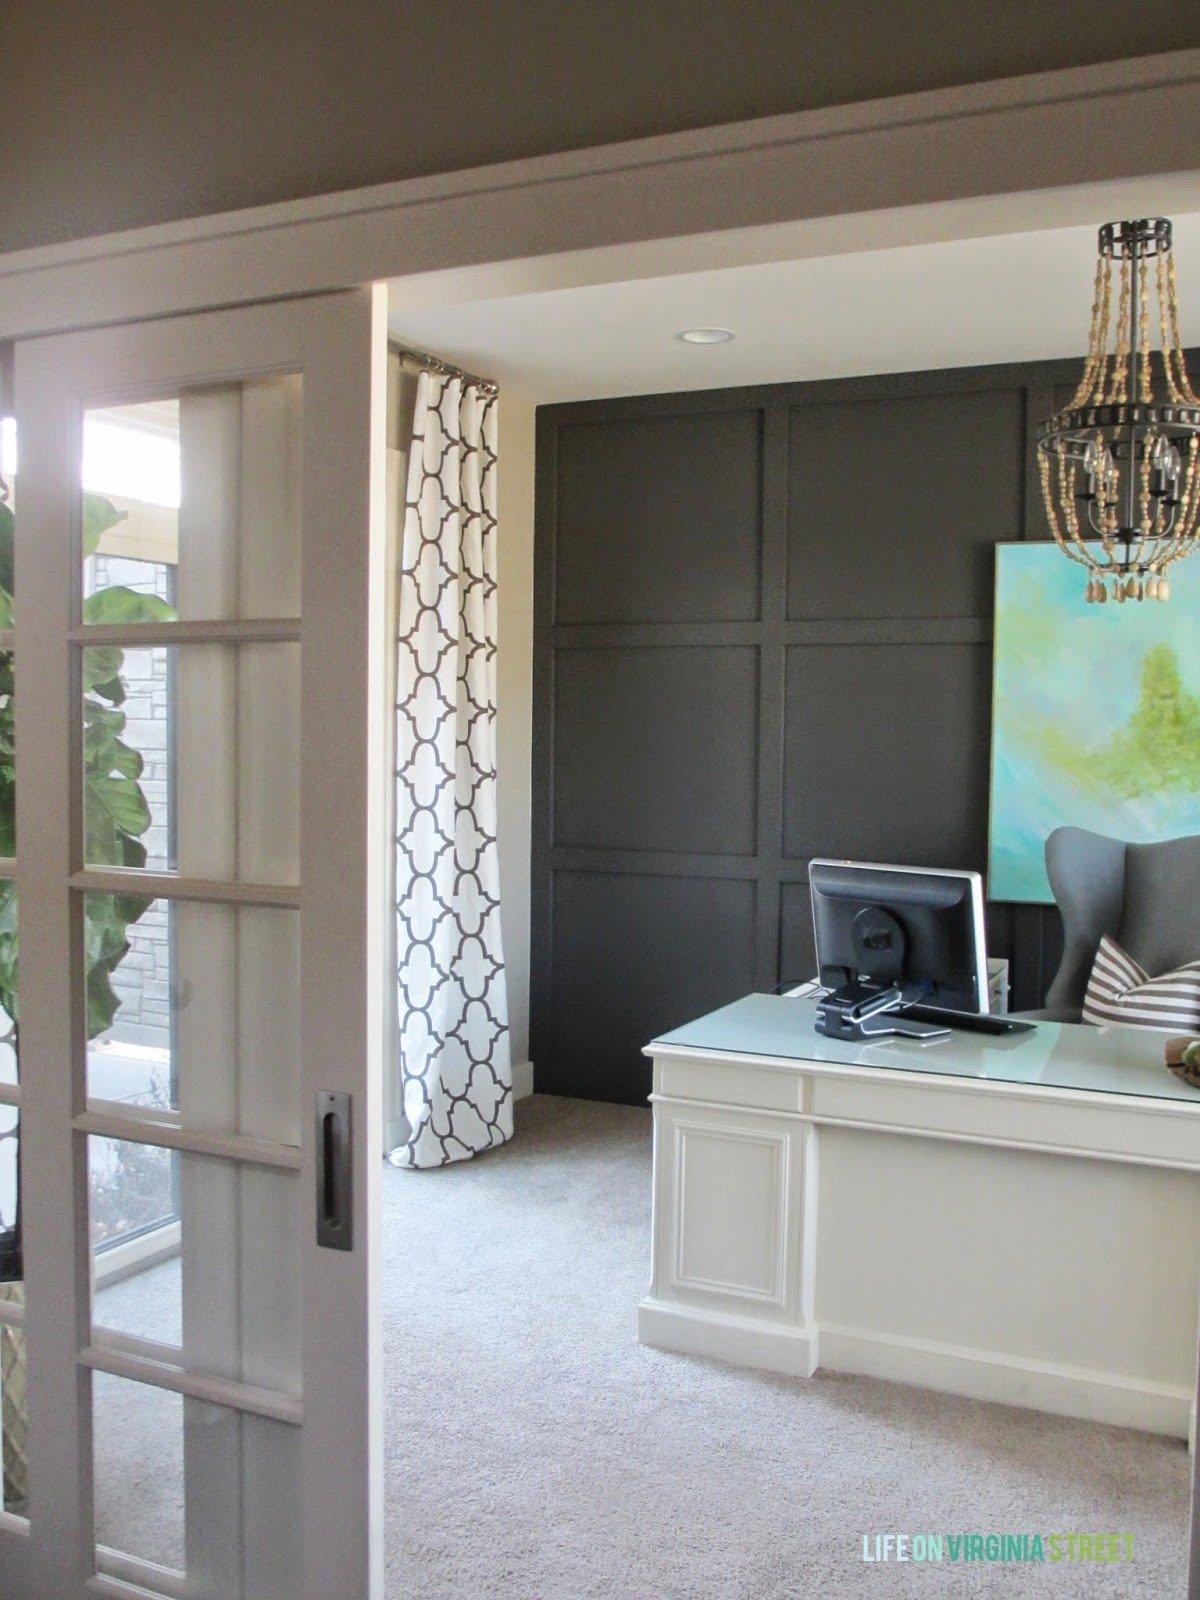 Home Office Makeover With DIY Wood Bead Chandelier | Remodelaholic |  Bloglovinu0027